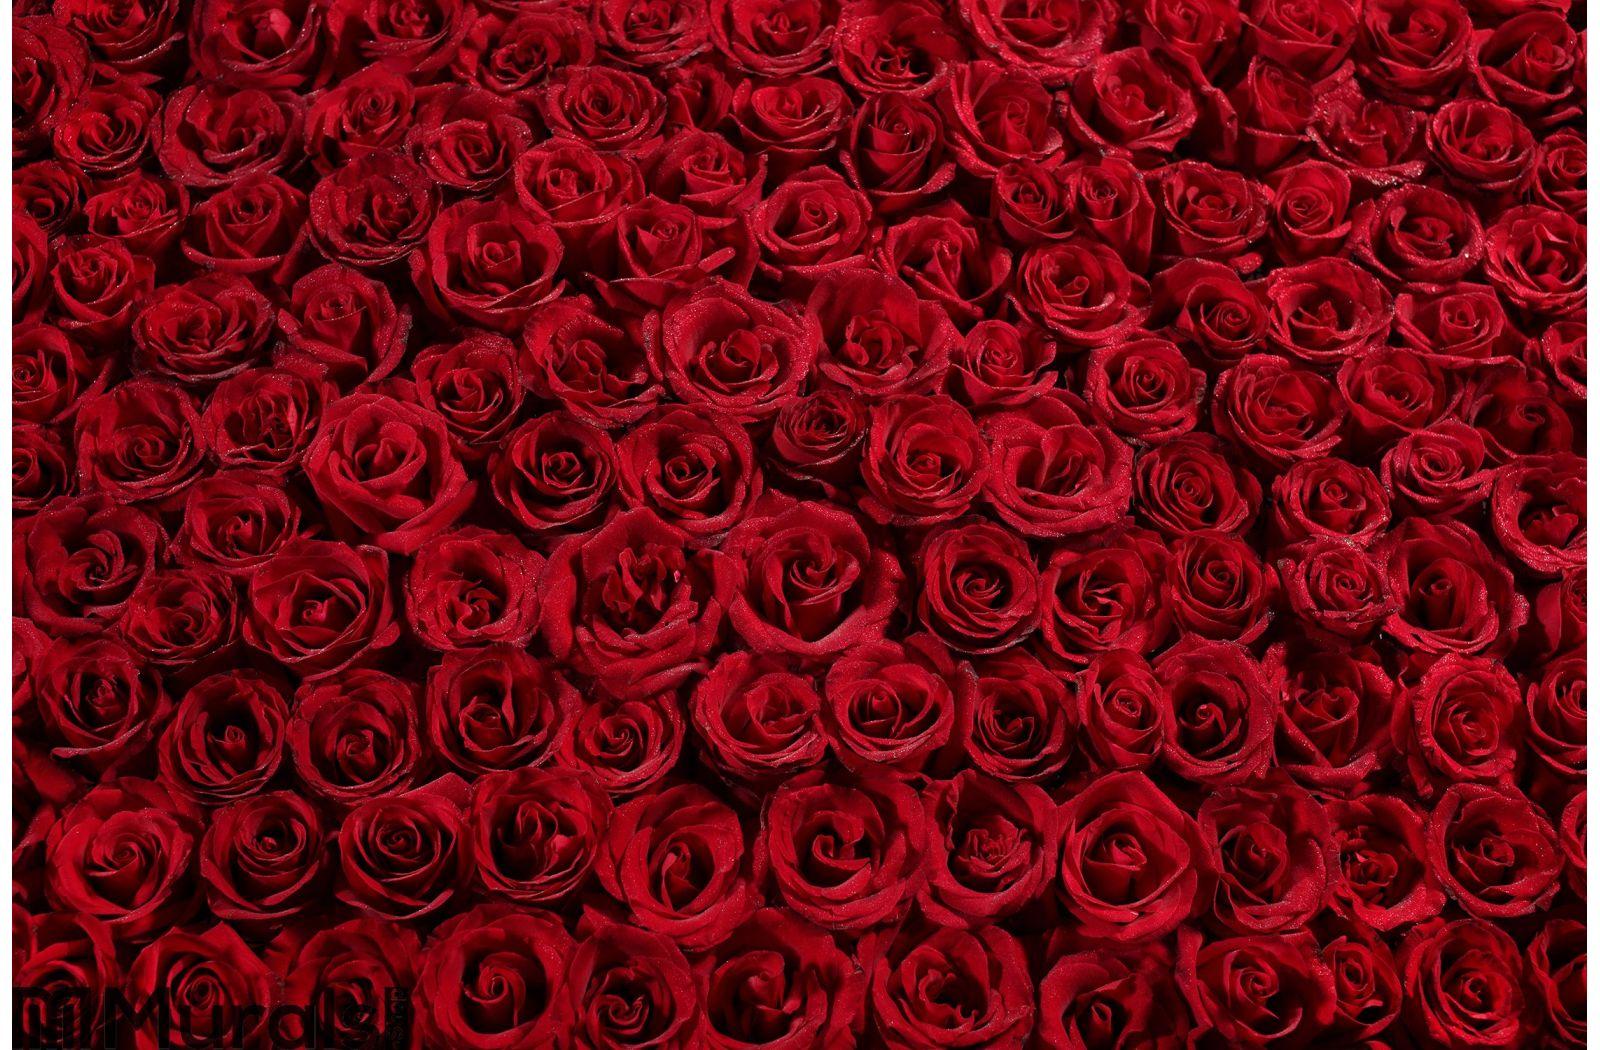 Bed of Roses Wall Mural Wall art Wall decor ...